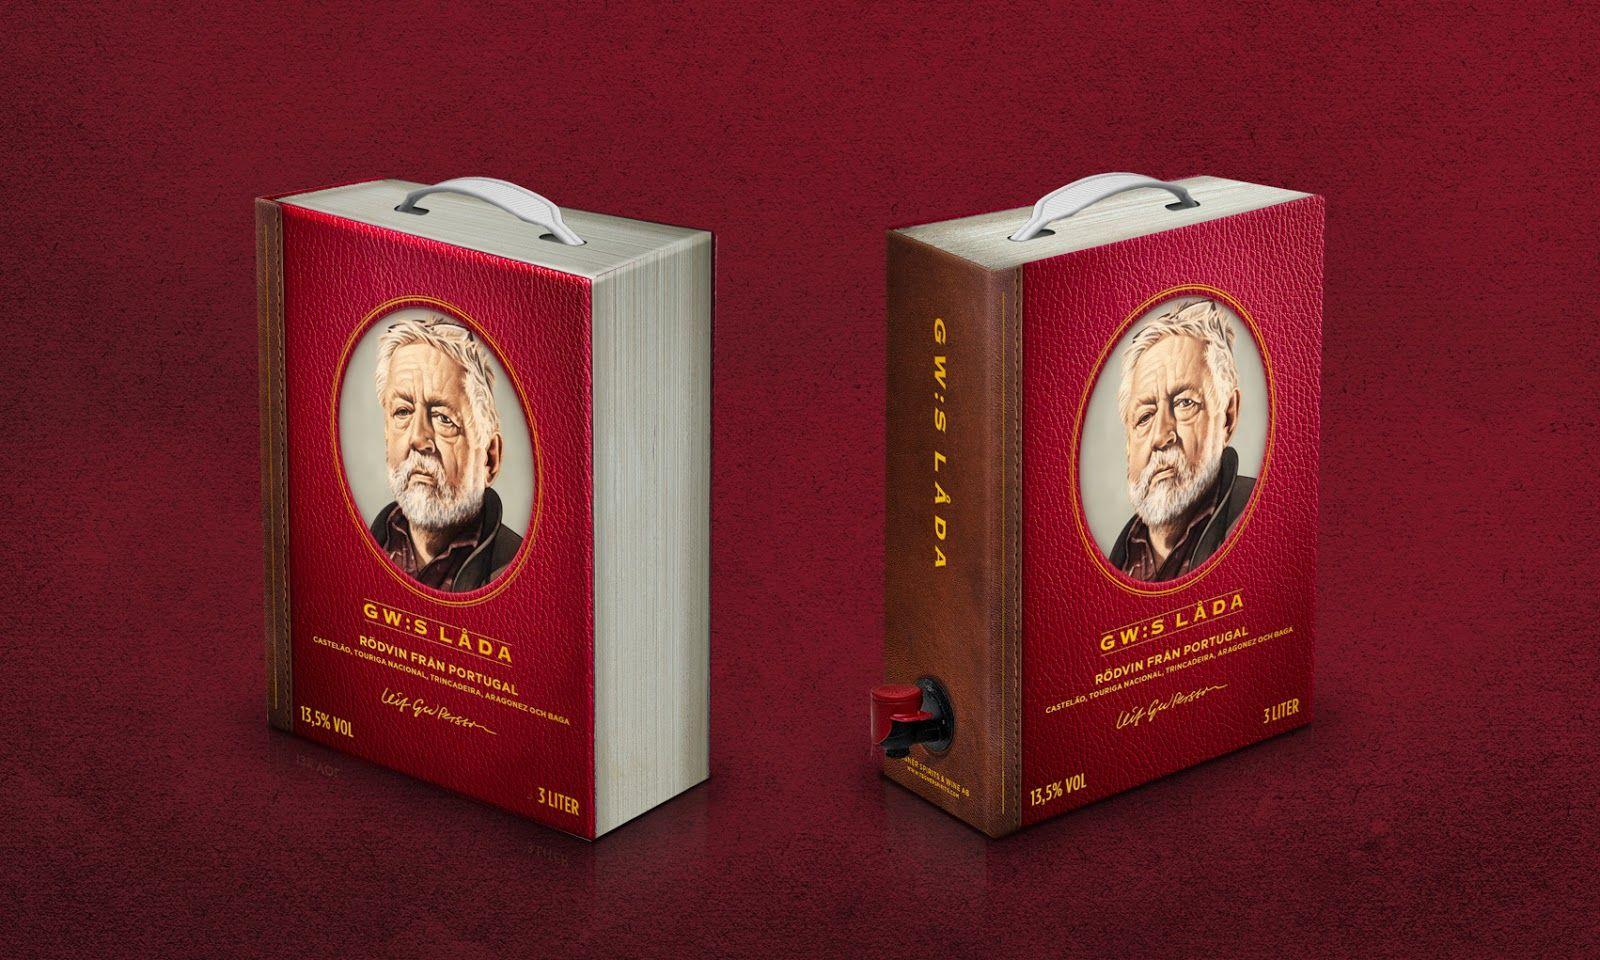 Gw S Bag In Book In 2020 Wine Packaging Design Creative Packaging Design Packaging Design Inspiration